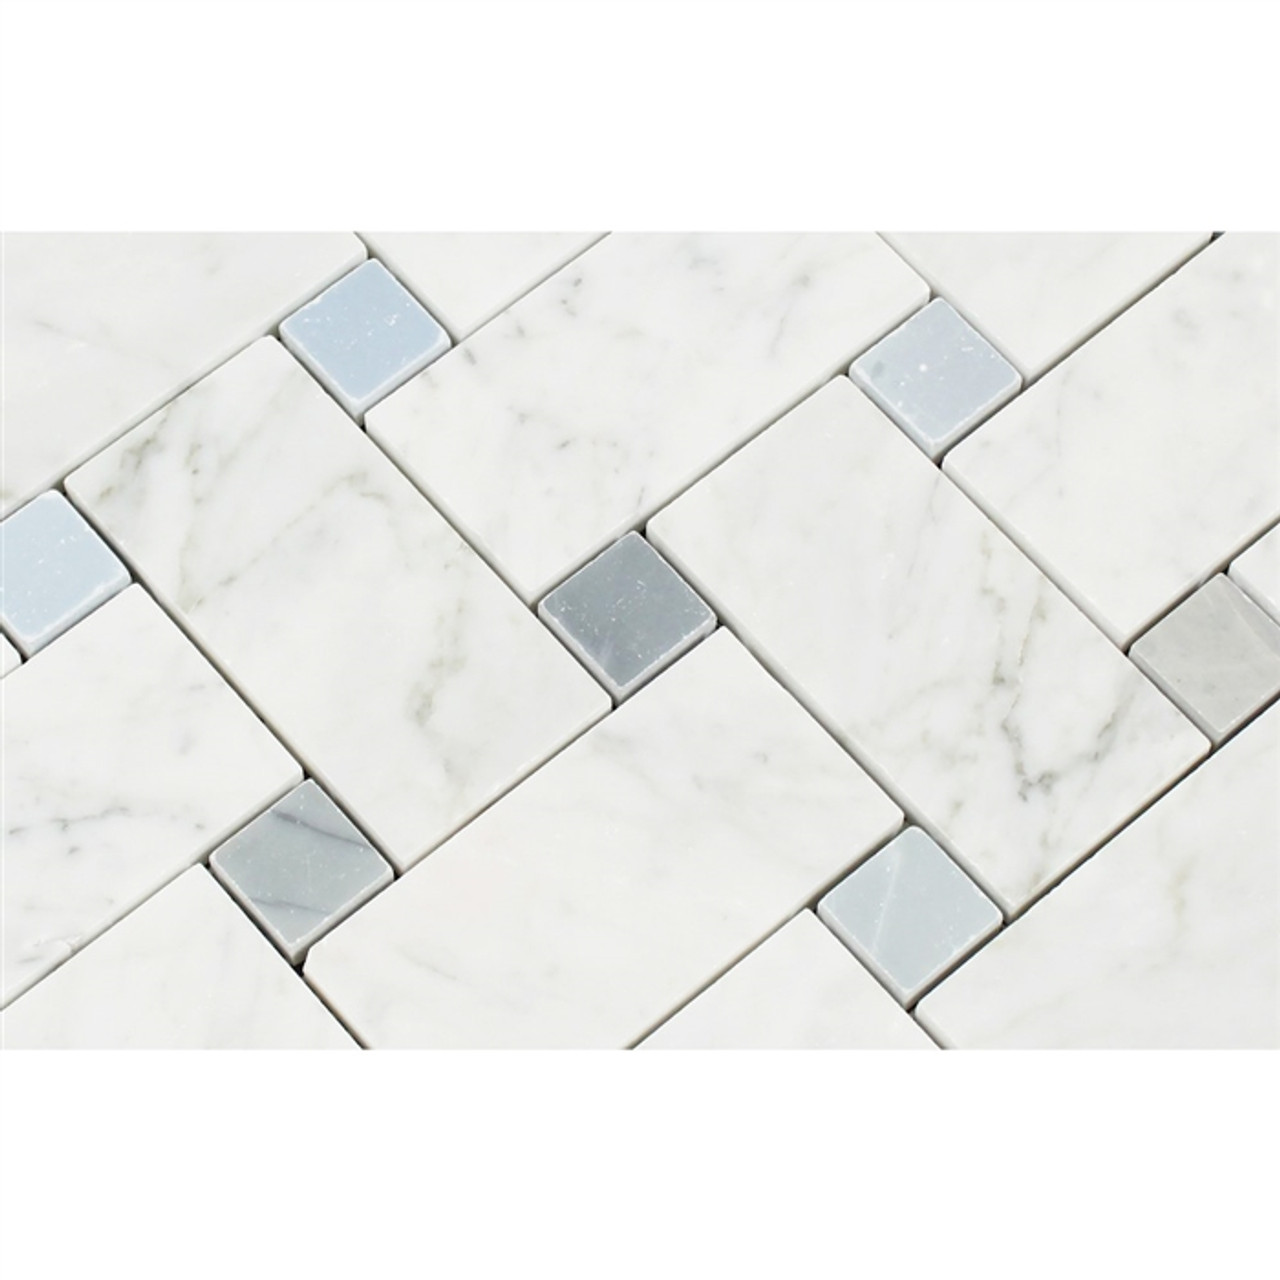 https tilestoreonline com carrara white marble large basketweave pattern mosaic tile blue gray dot polished